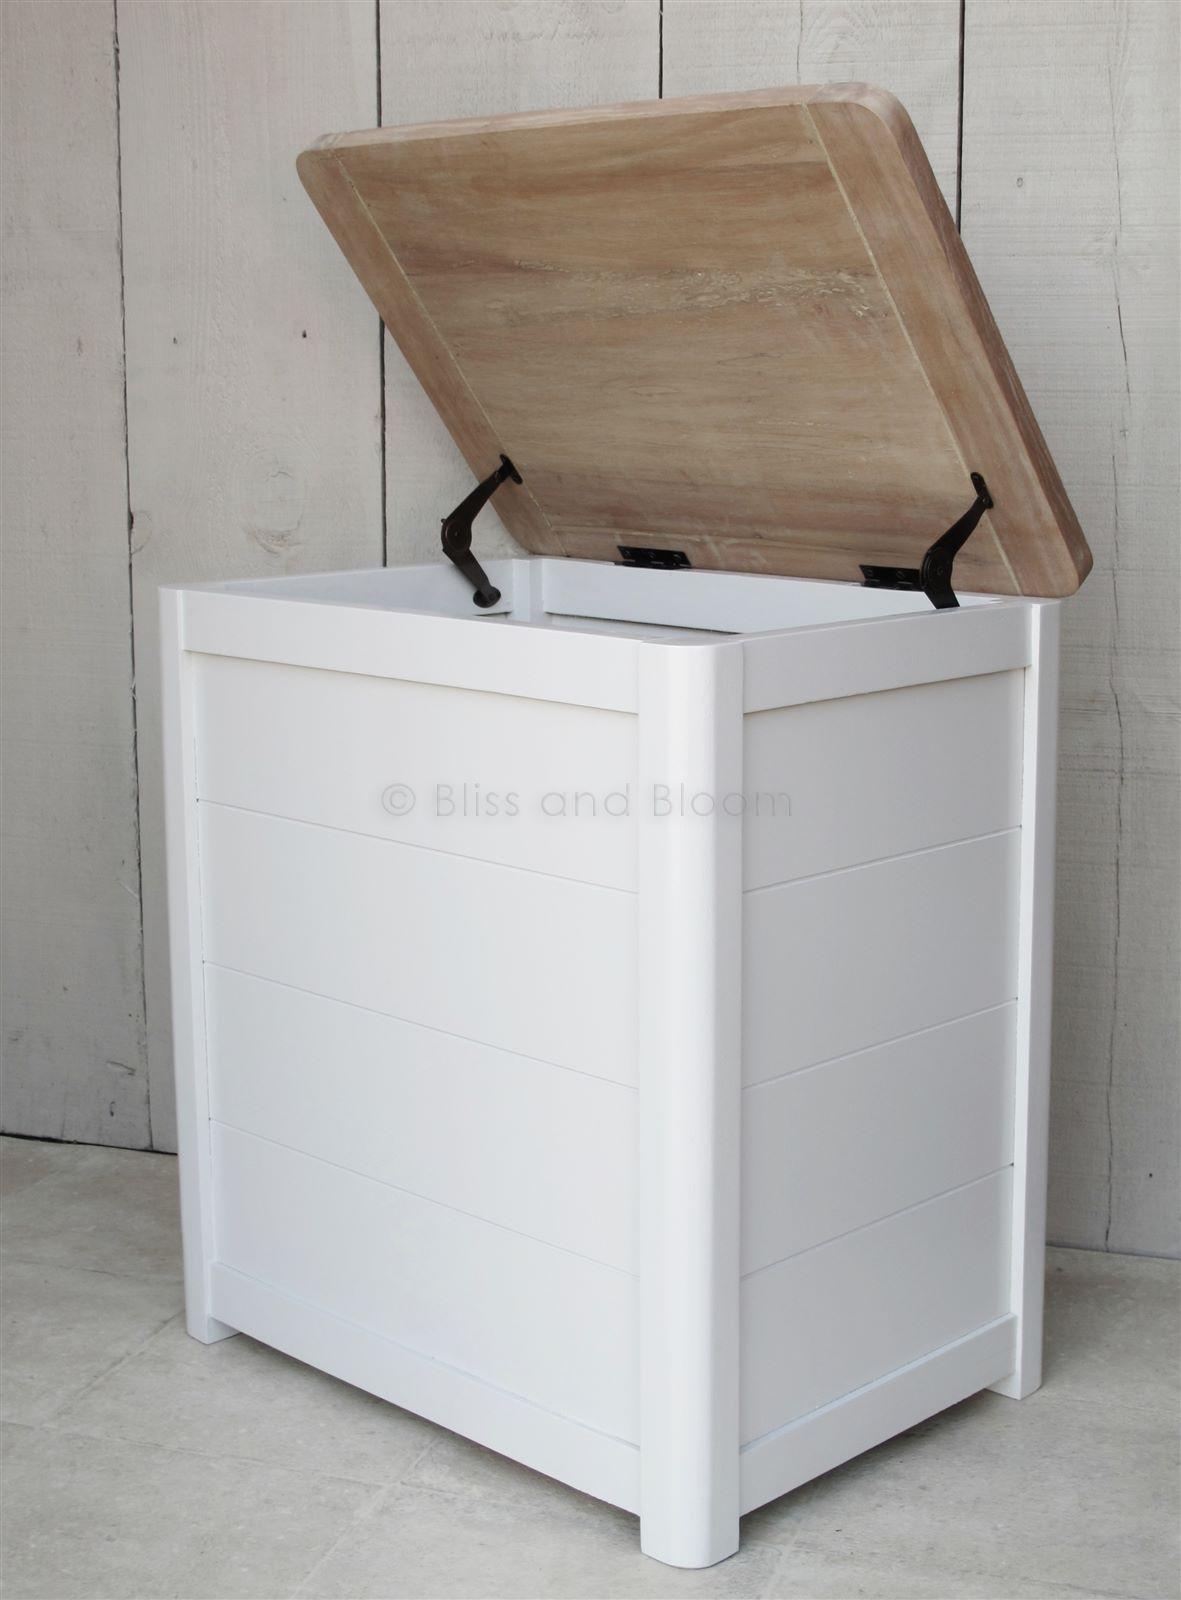 wooden laundry linen bin medium bliss and bloom ltd. Black Bedroom Furniture Sets. Home Design Ideas